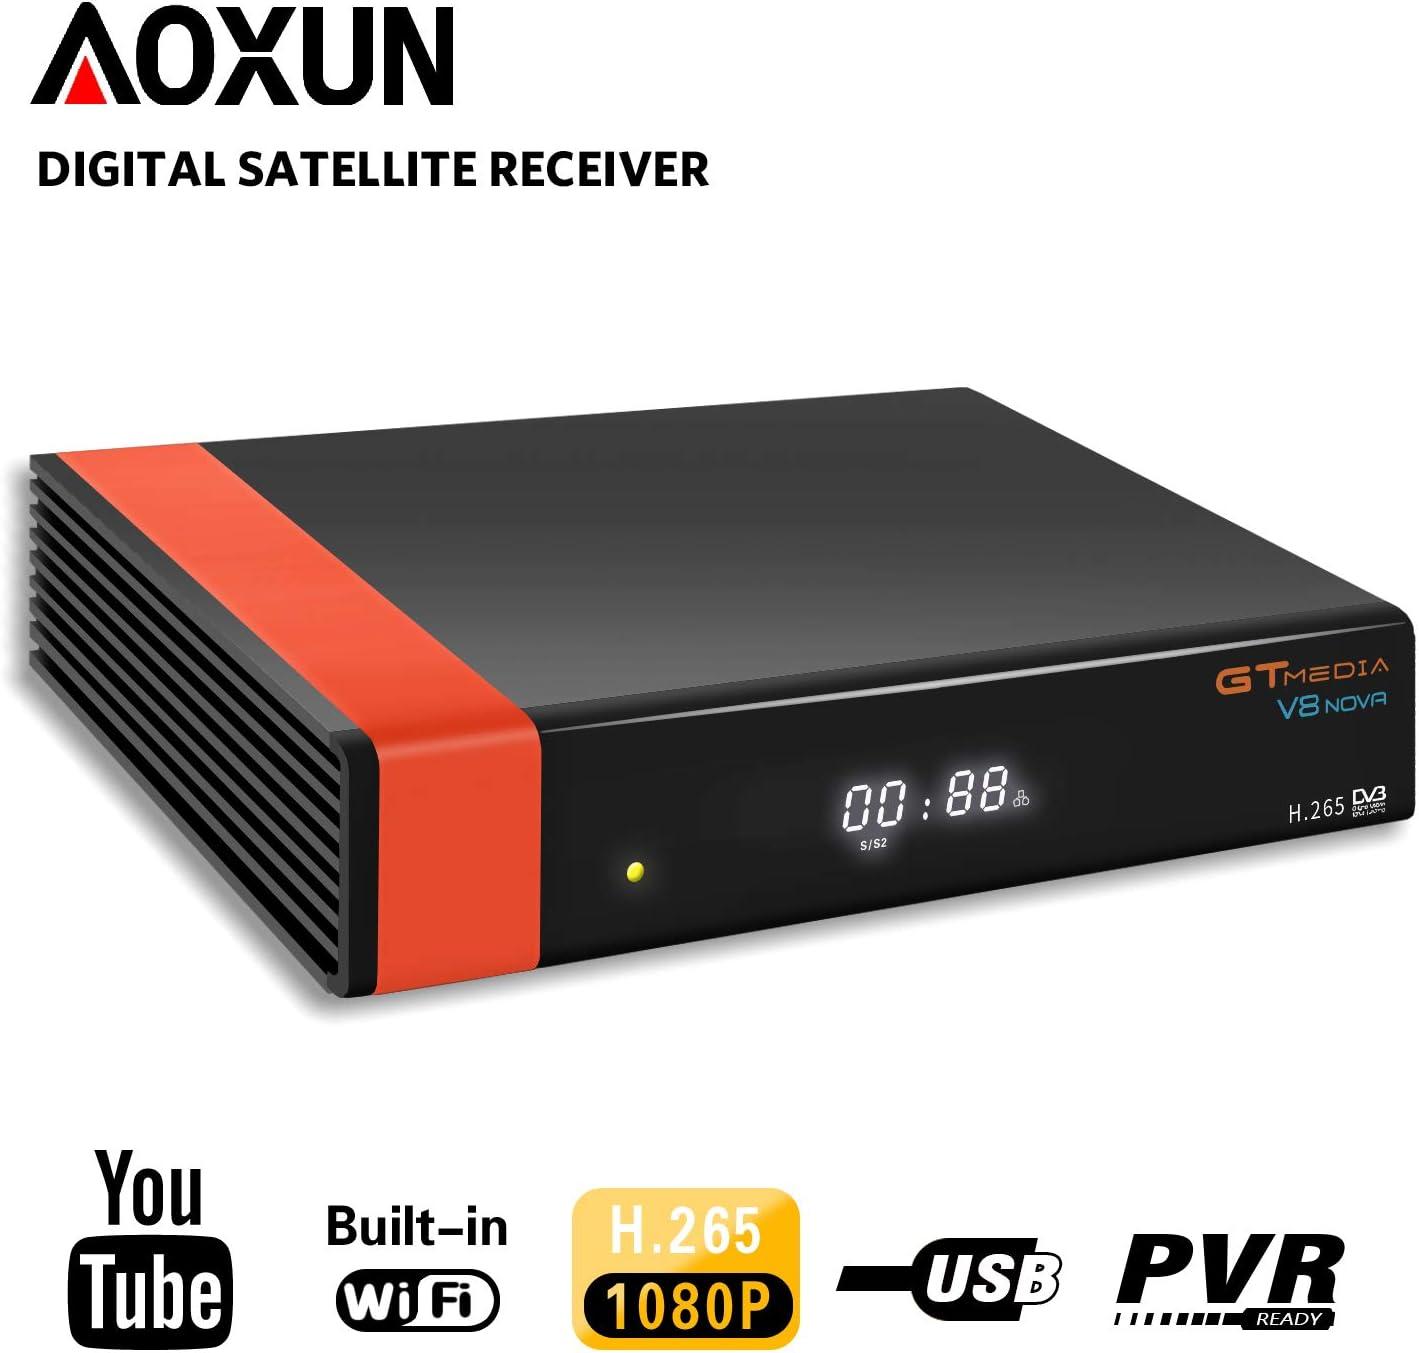 1080P HD DVB-S2 Digital Satellite Receiver Youtube TV Tuner WIFI Key FTA Decoder